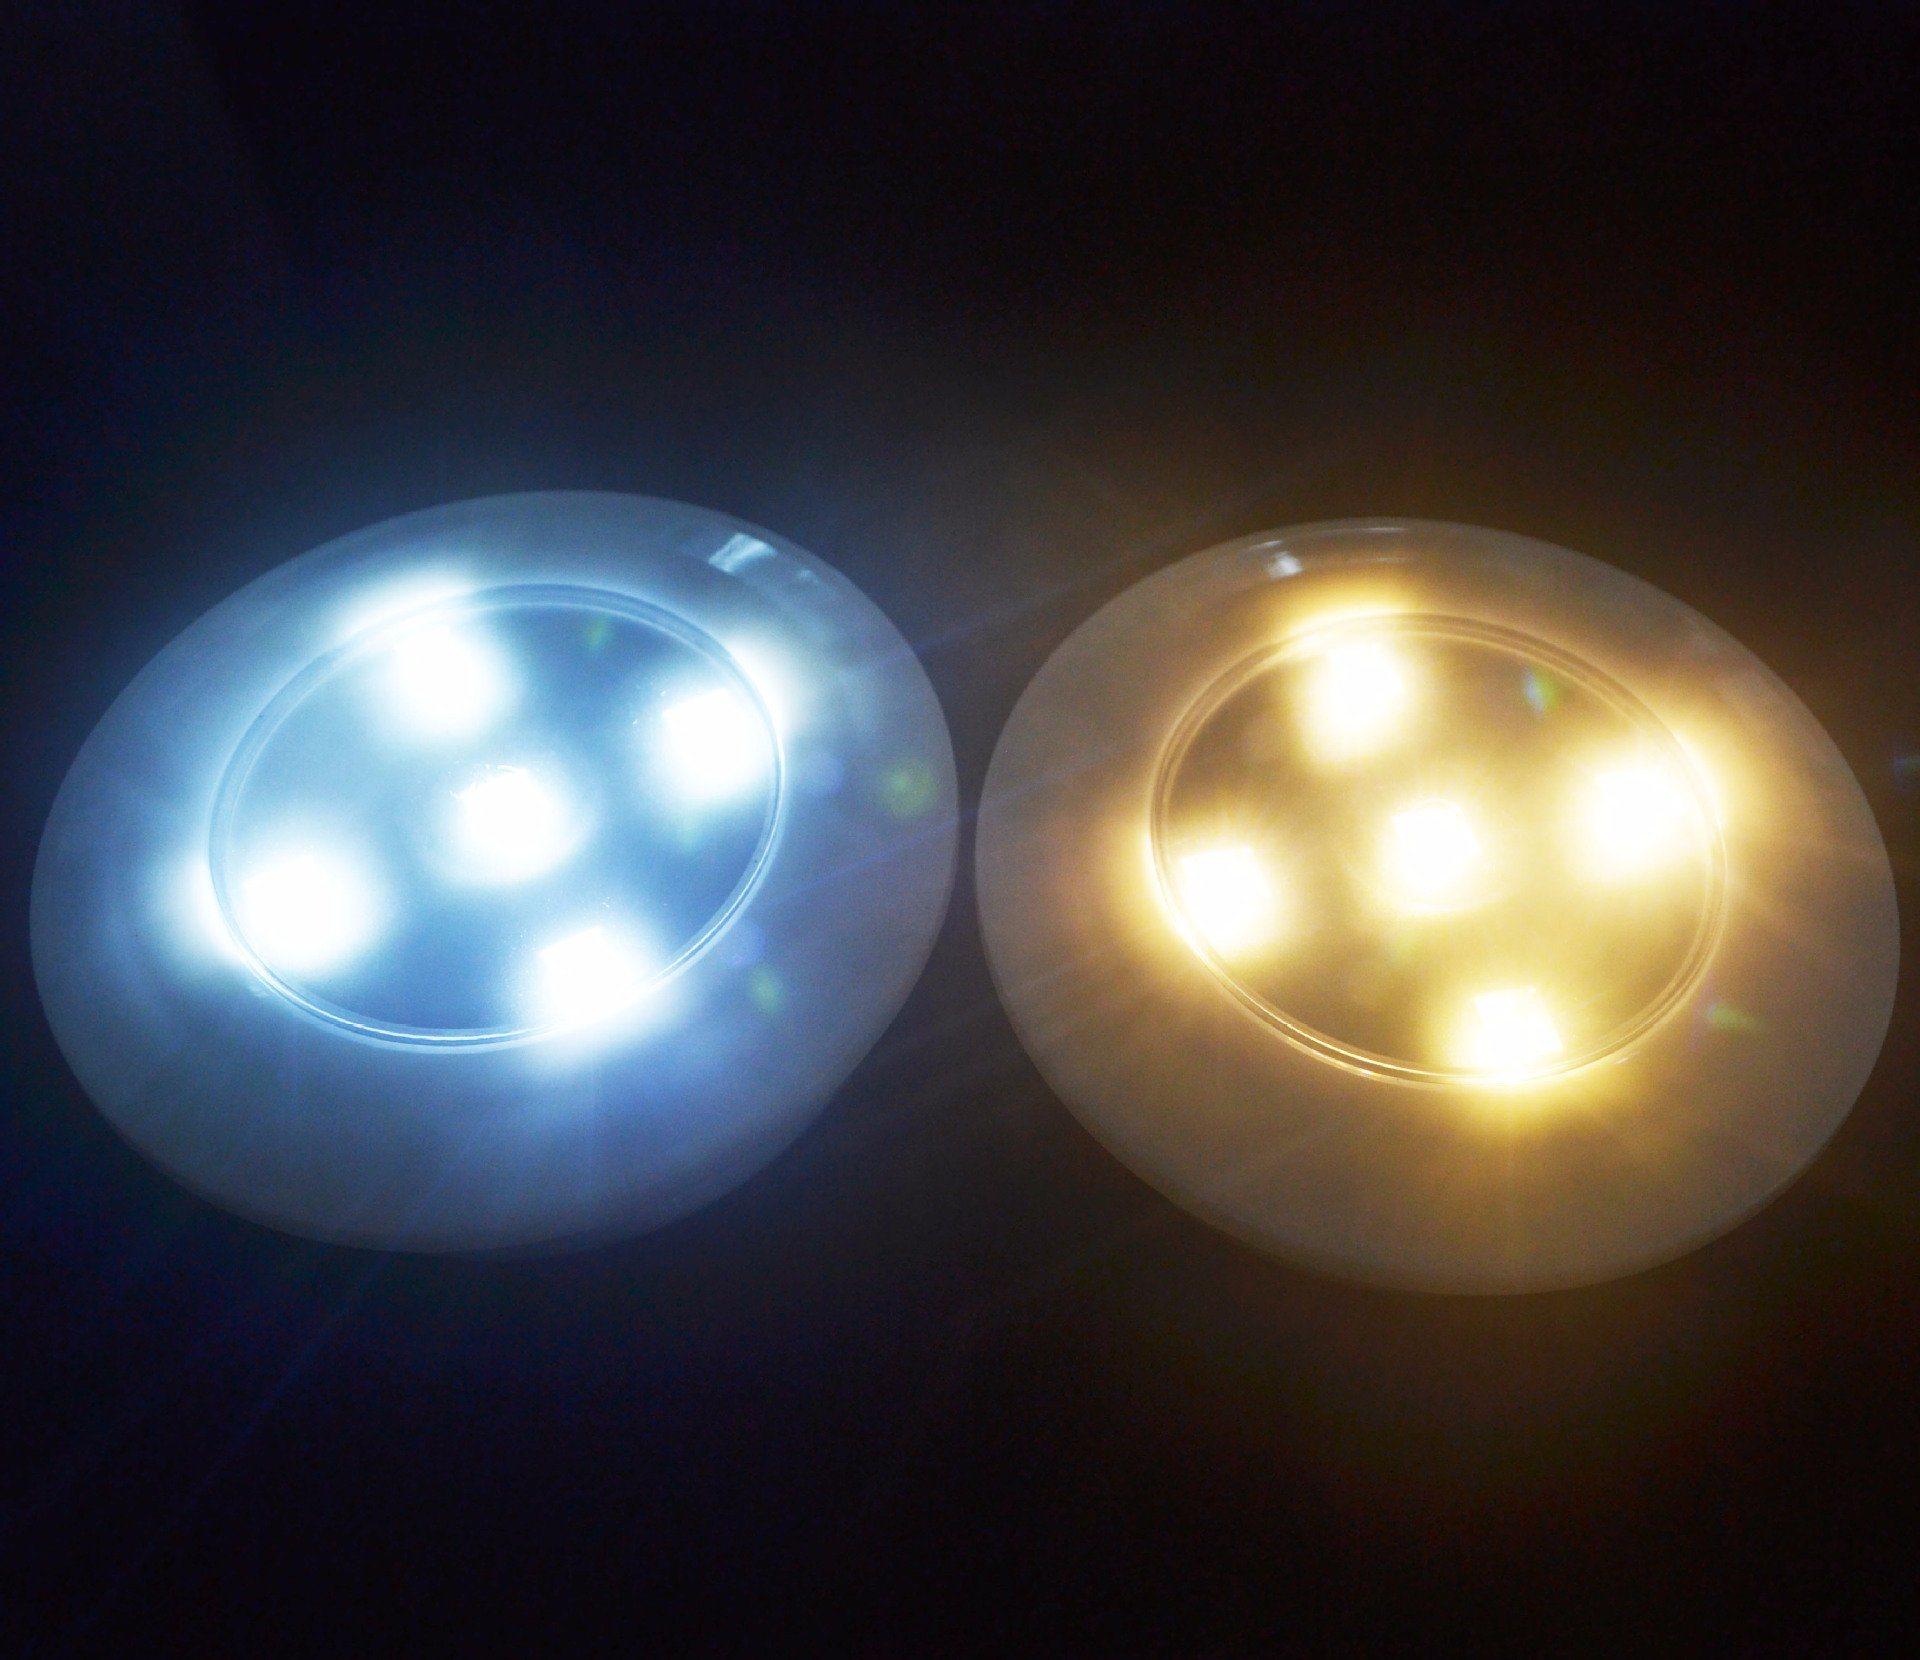 5 Led Wireless Remote Control Light Pat Touch Nightlight Bedroom Wardrobe Lamp